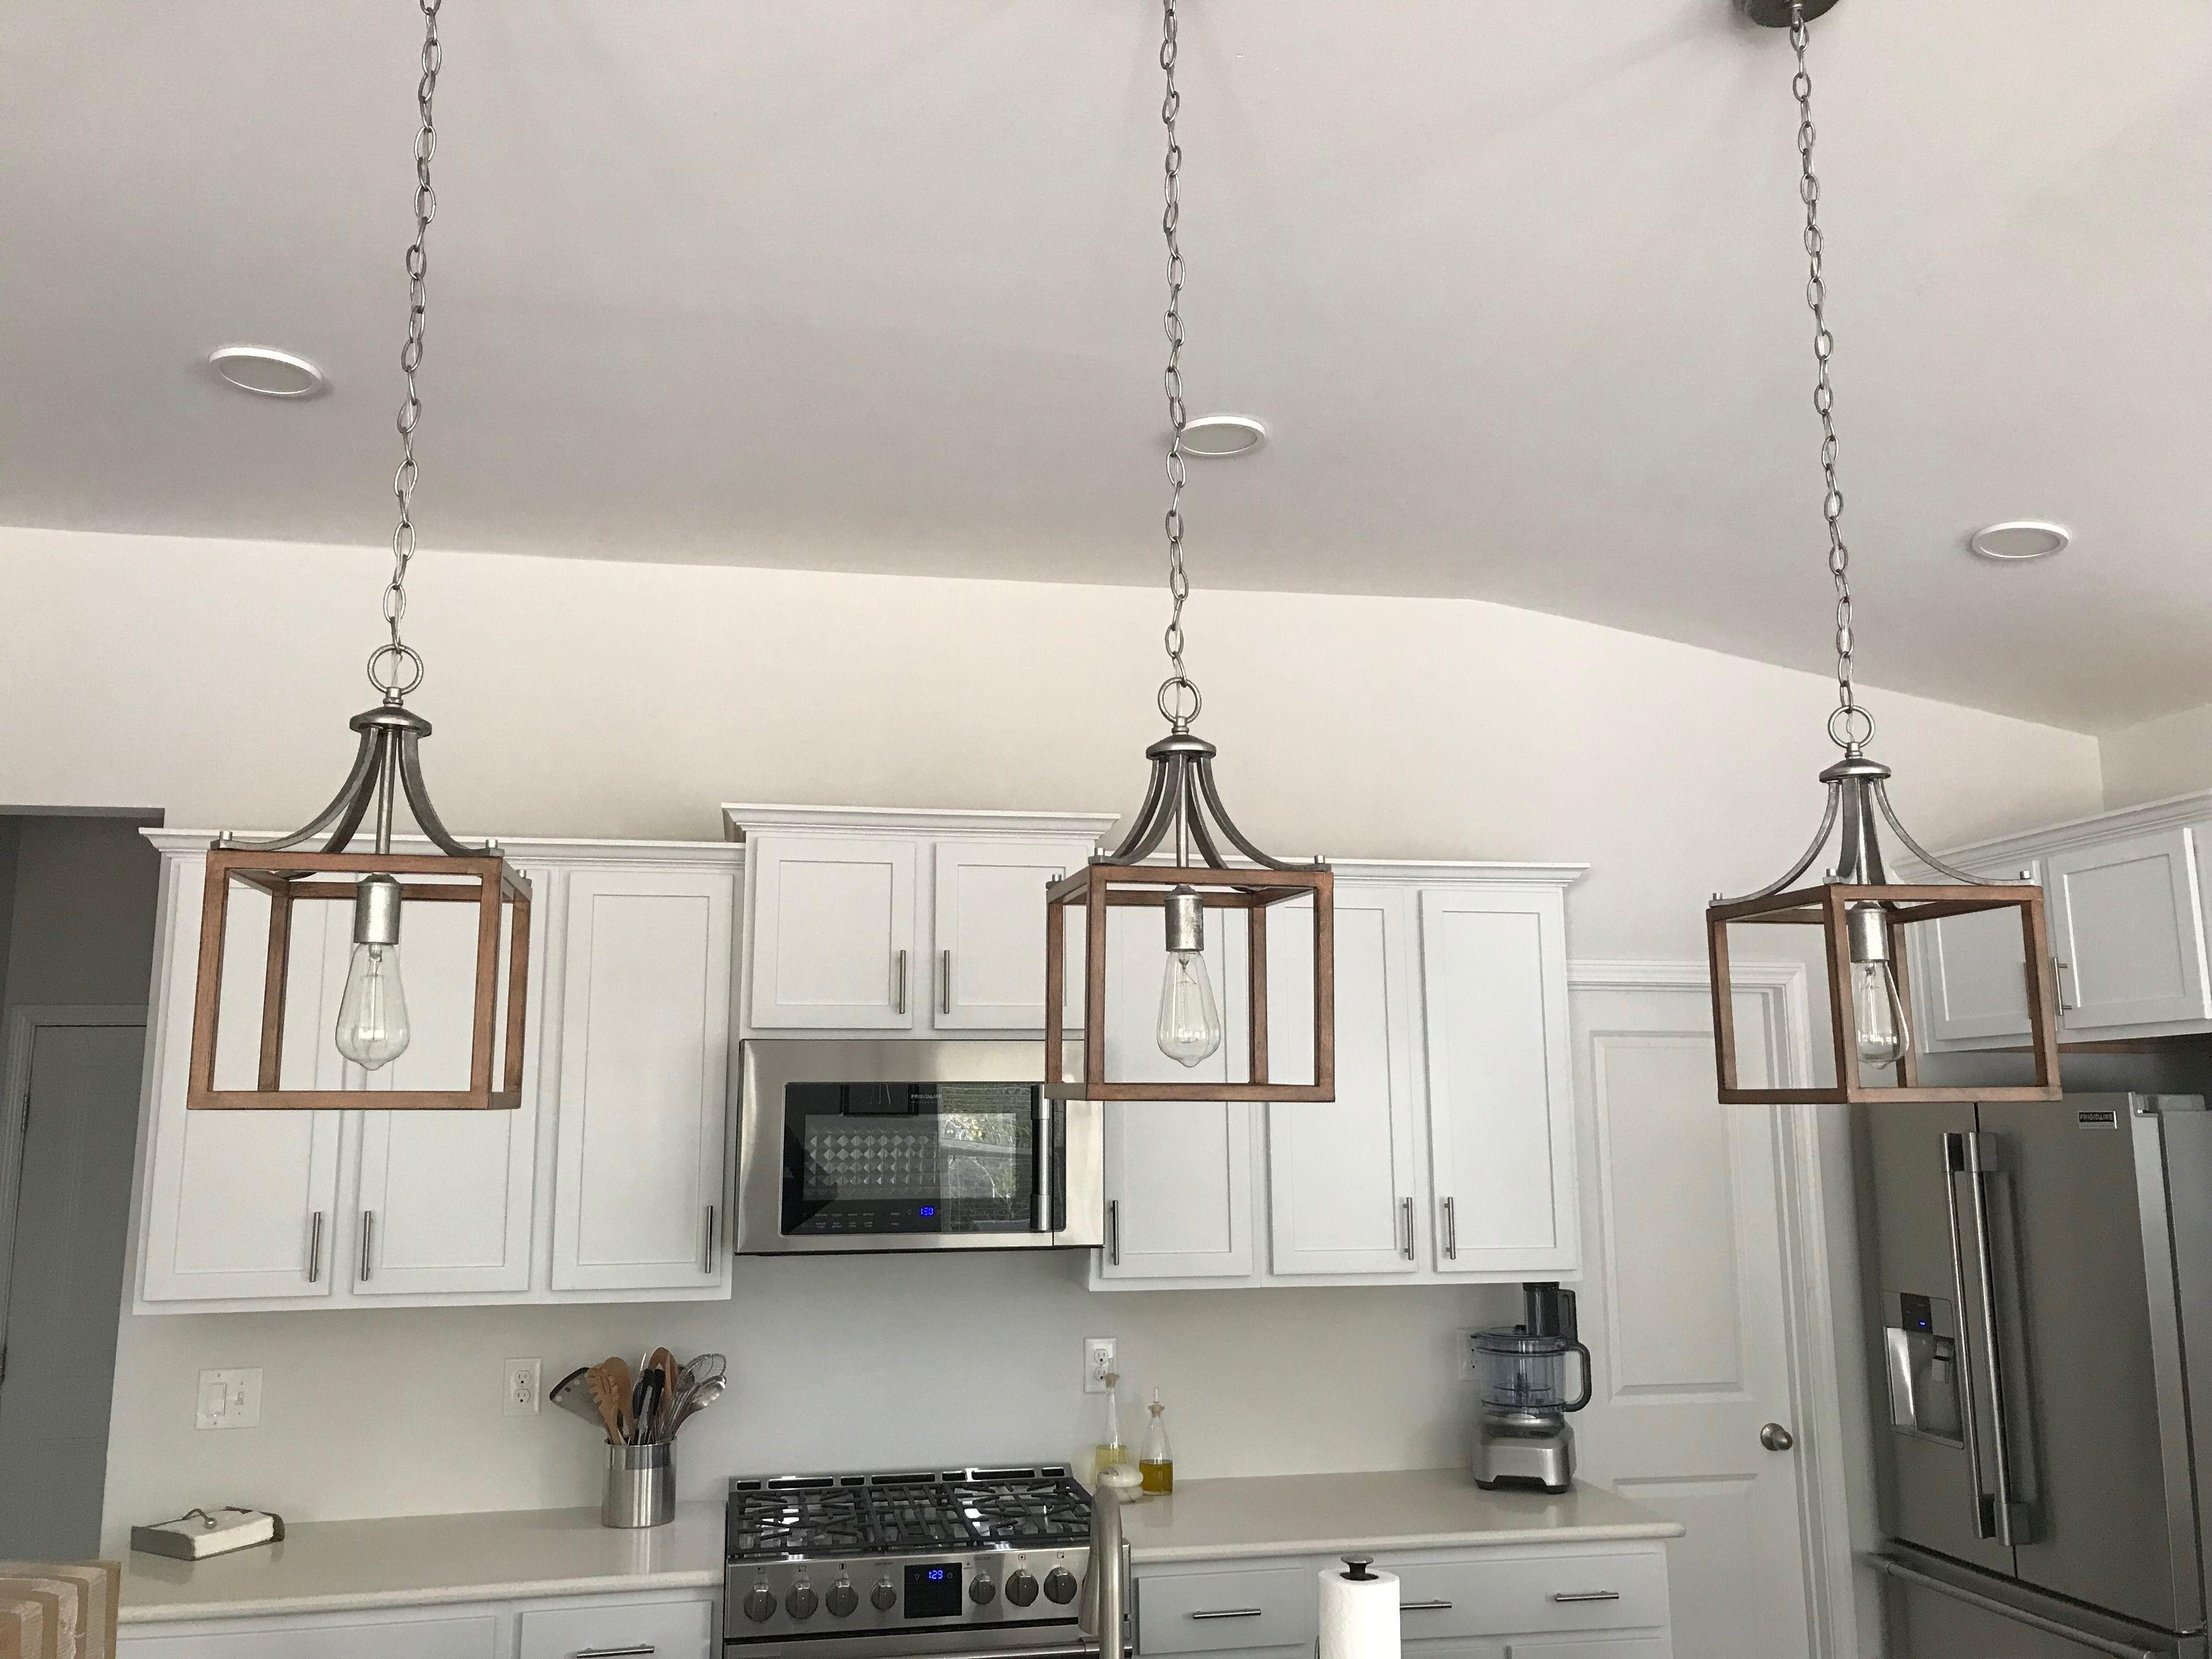 Home Depot Boswell pendants 3 Home decor, Home, Interior